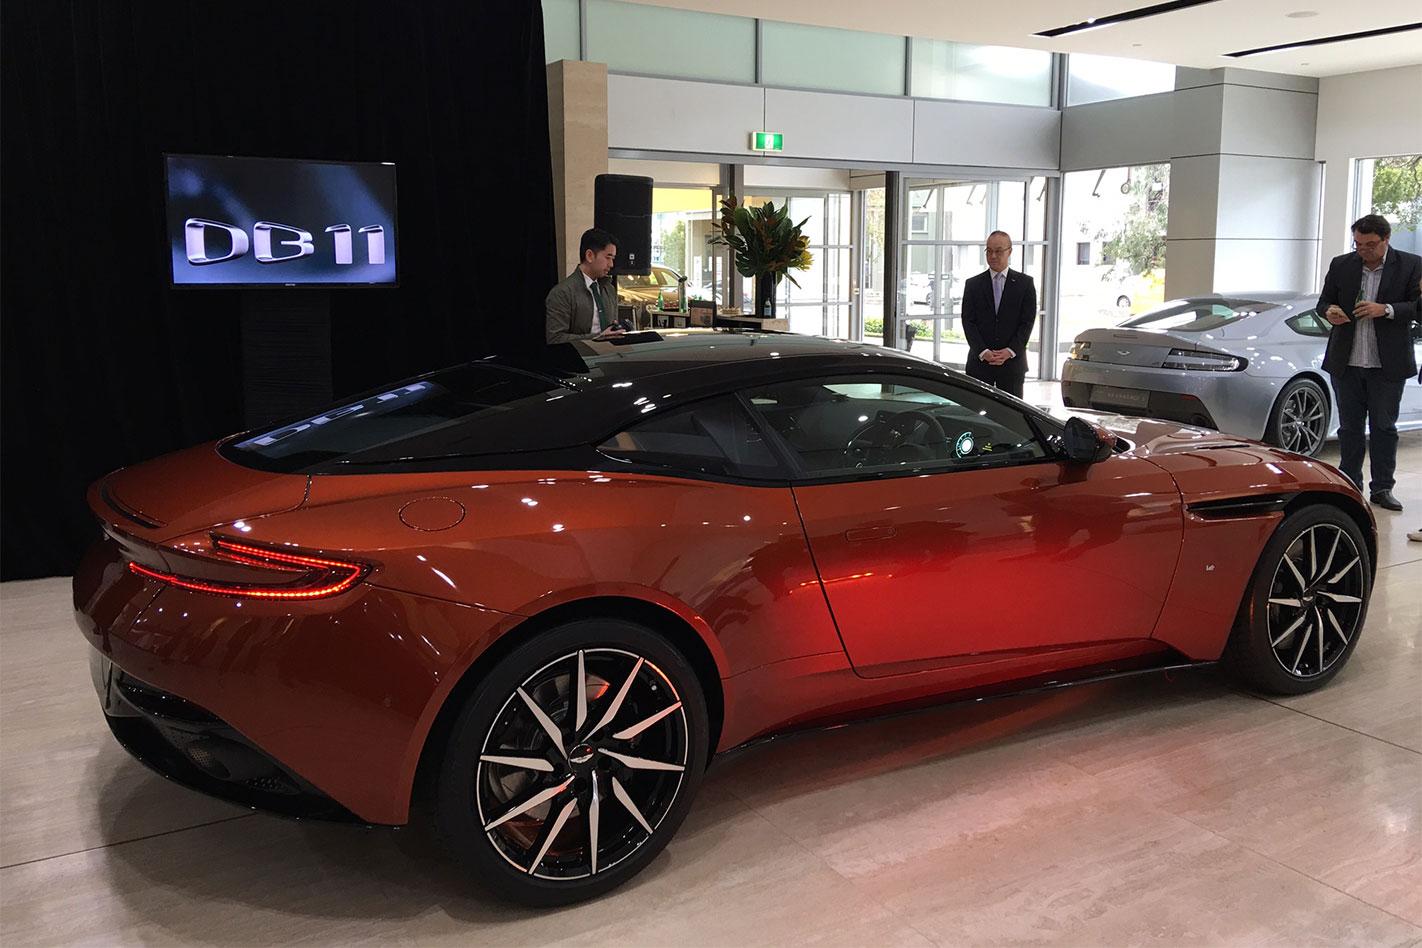 Aston -Martin -DB11-rearr